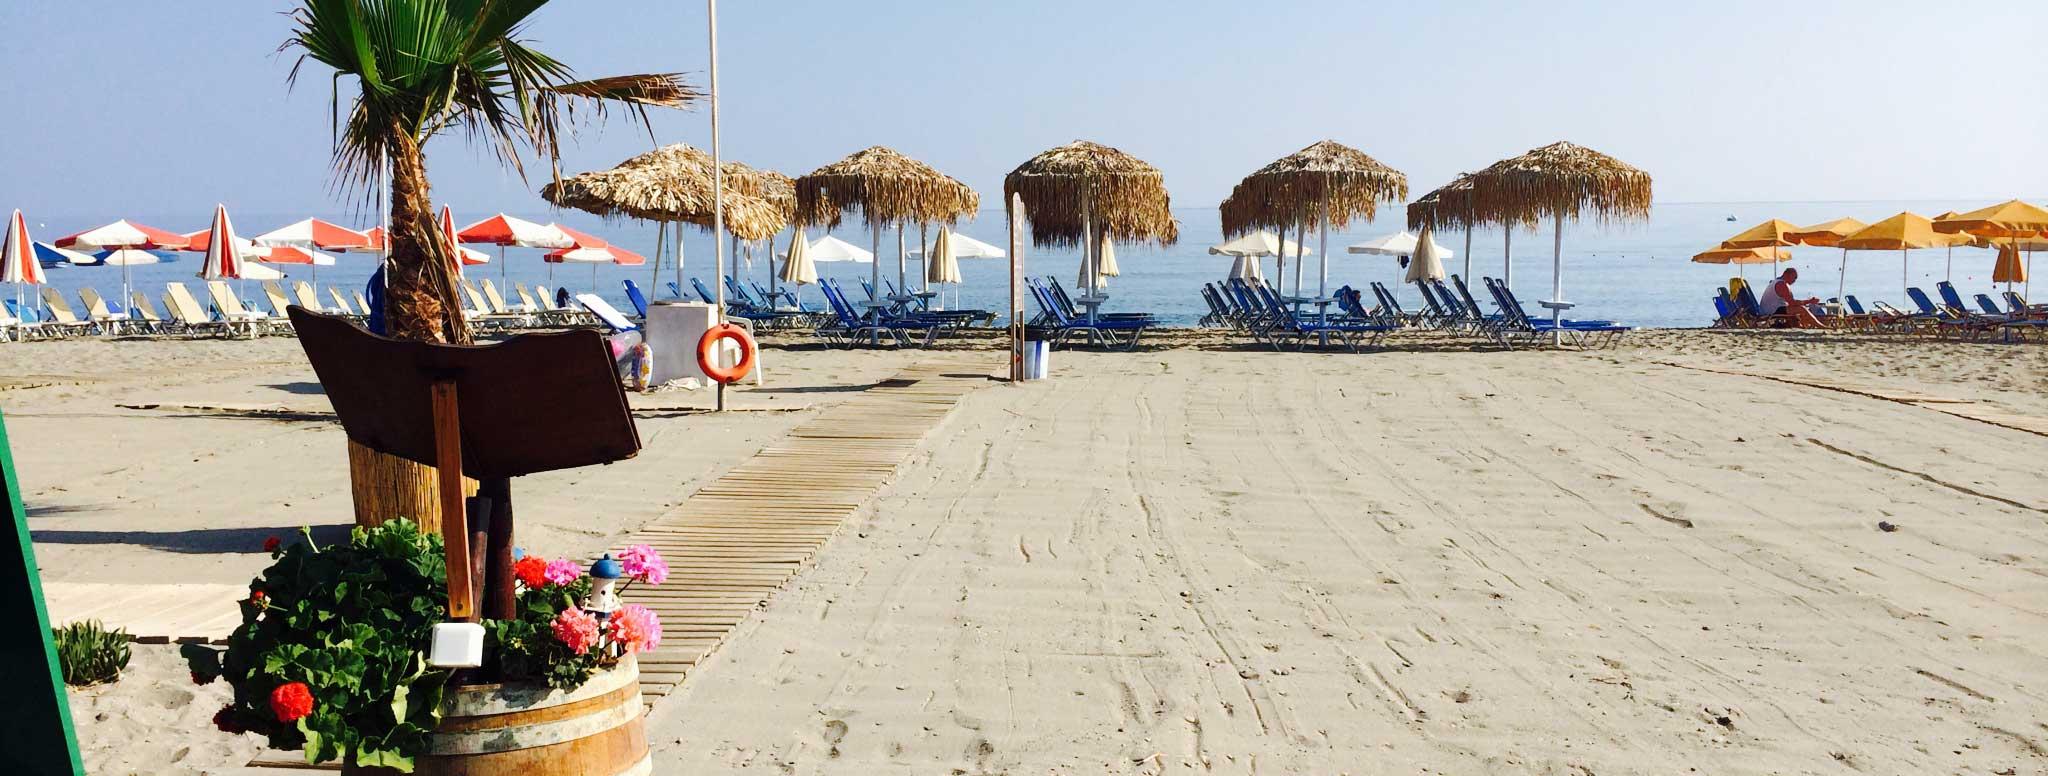 Sonio Beach Hotel - Sonio Beach-Stranden